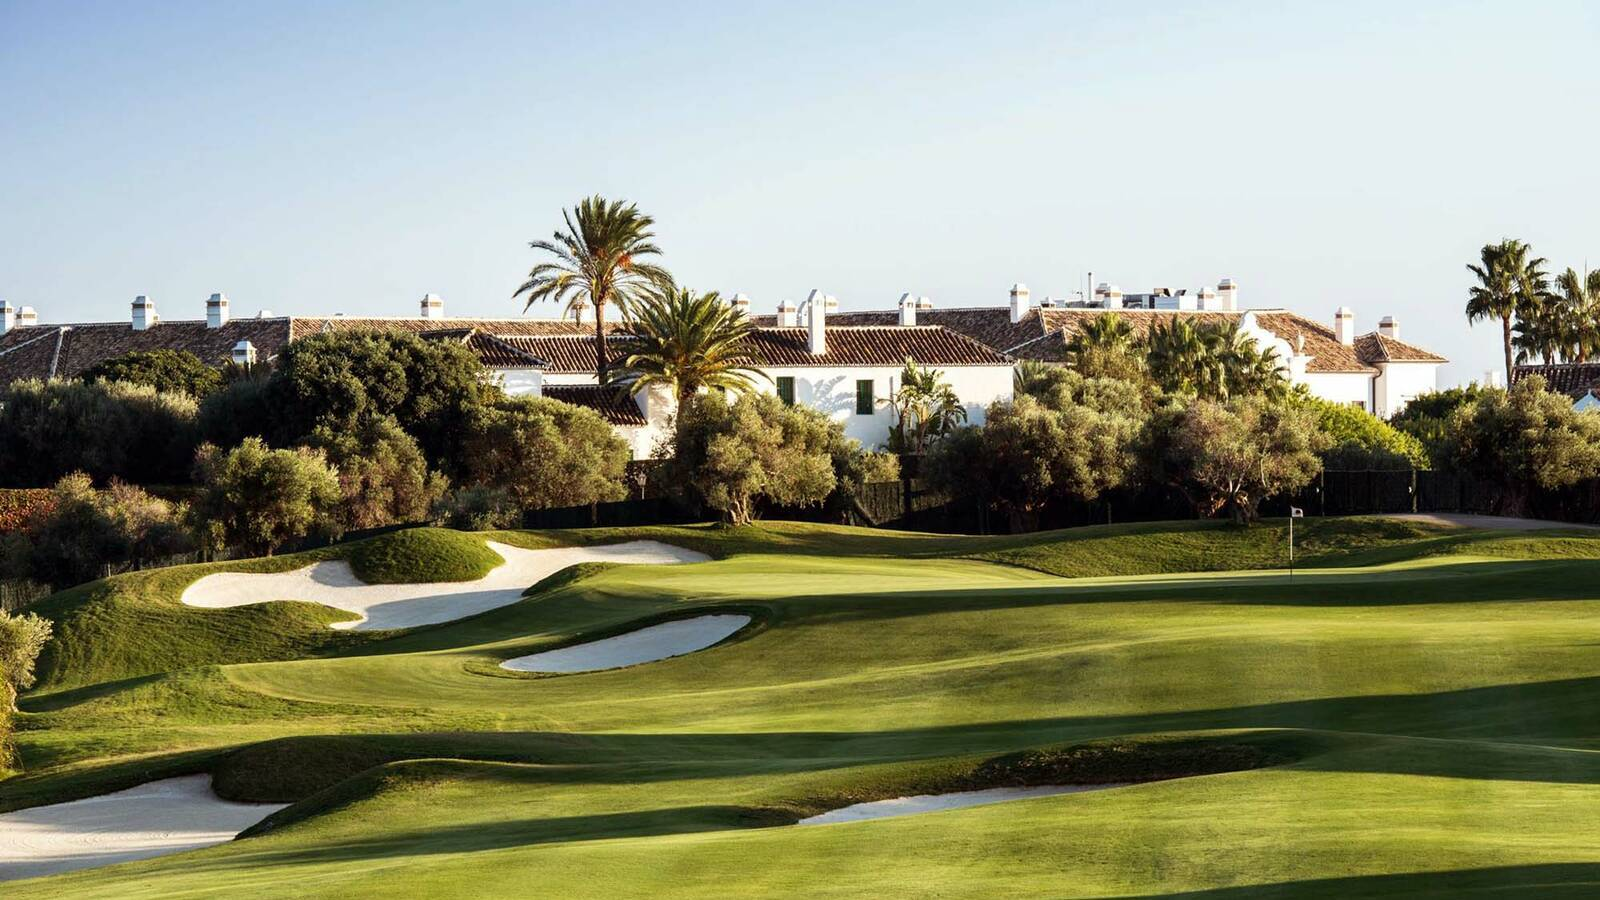 Finca Cortesin Malaga Espagne Golf.jpeg